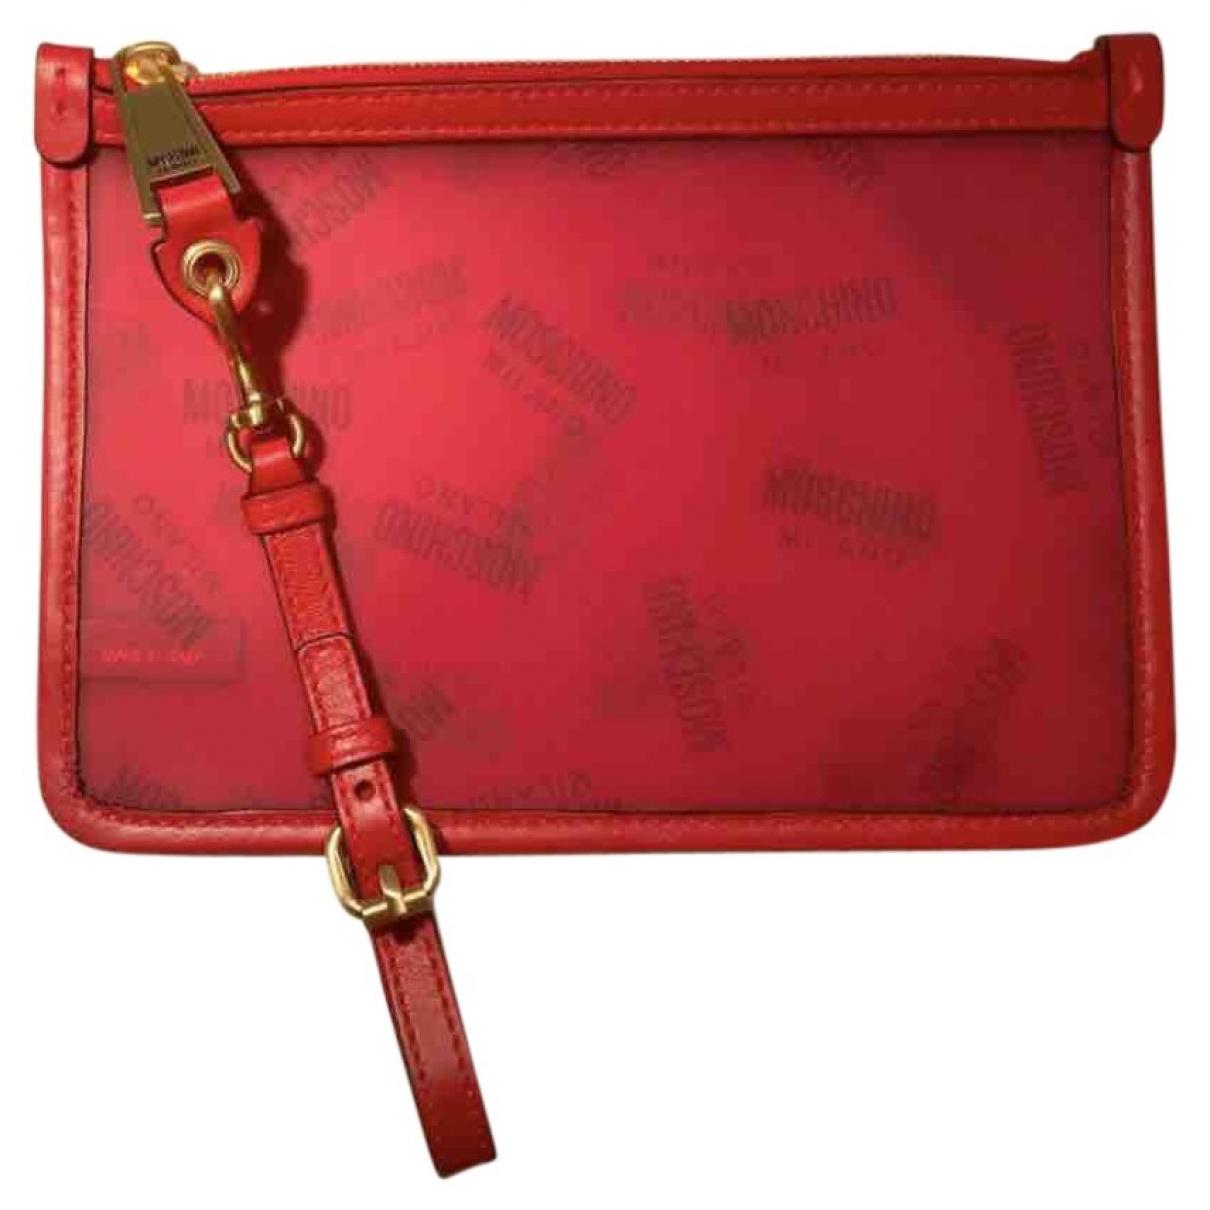 Moschino \N Red Clutch bag for Women \N